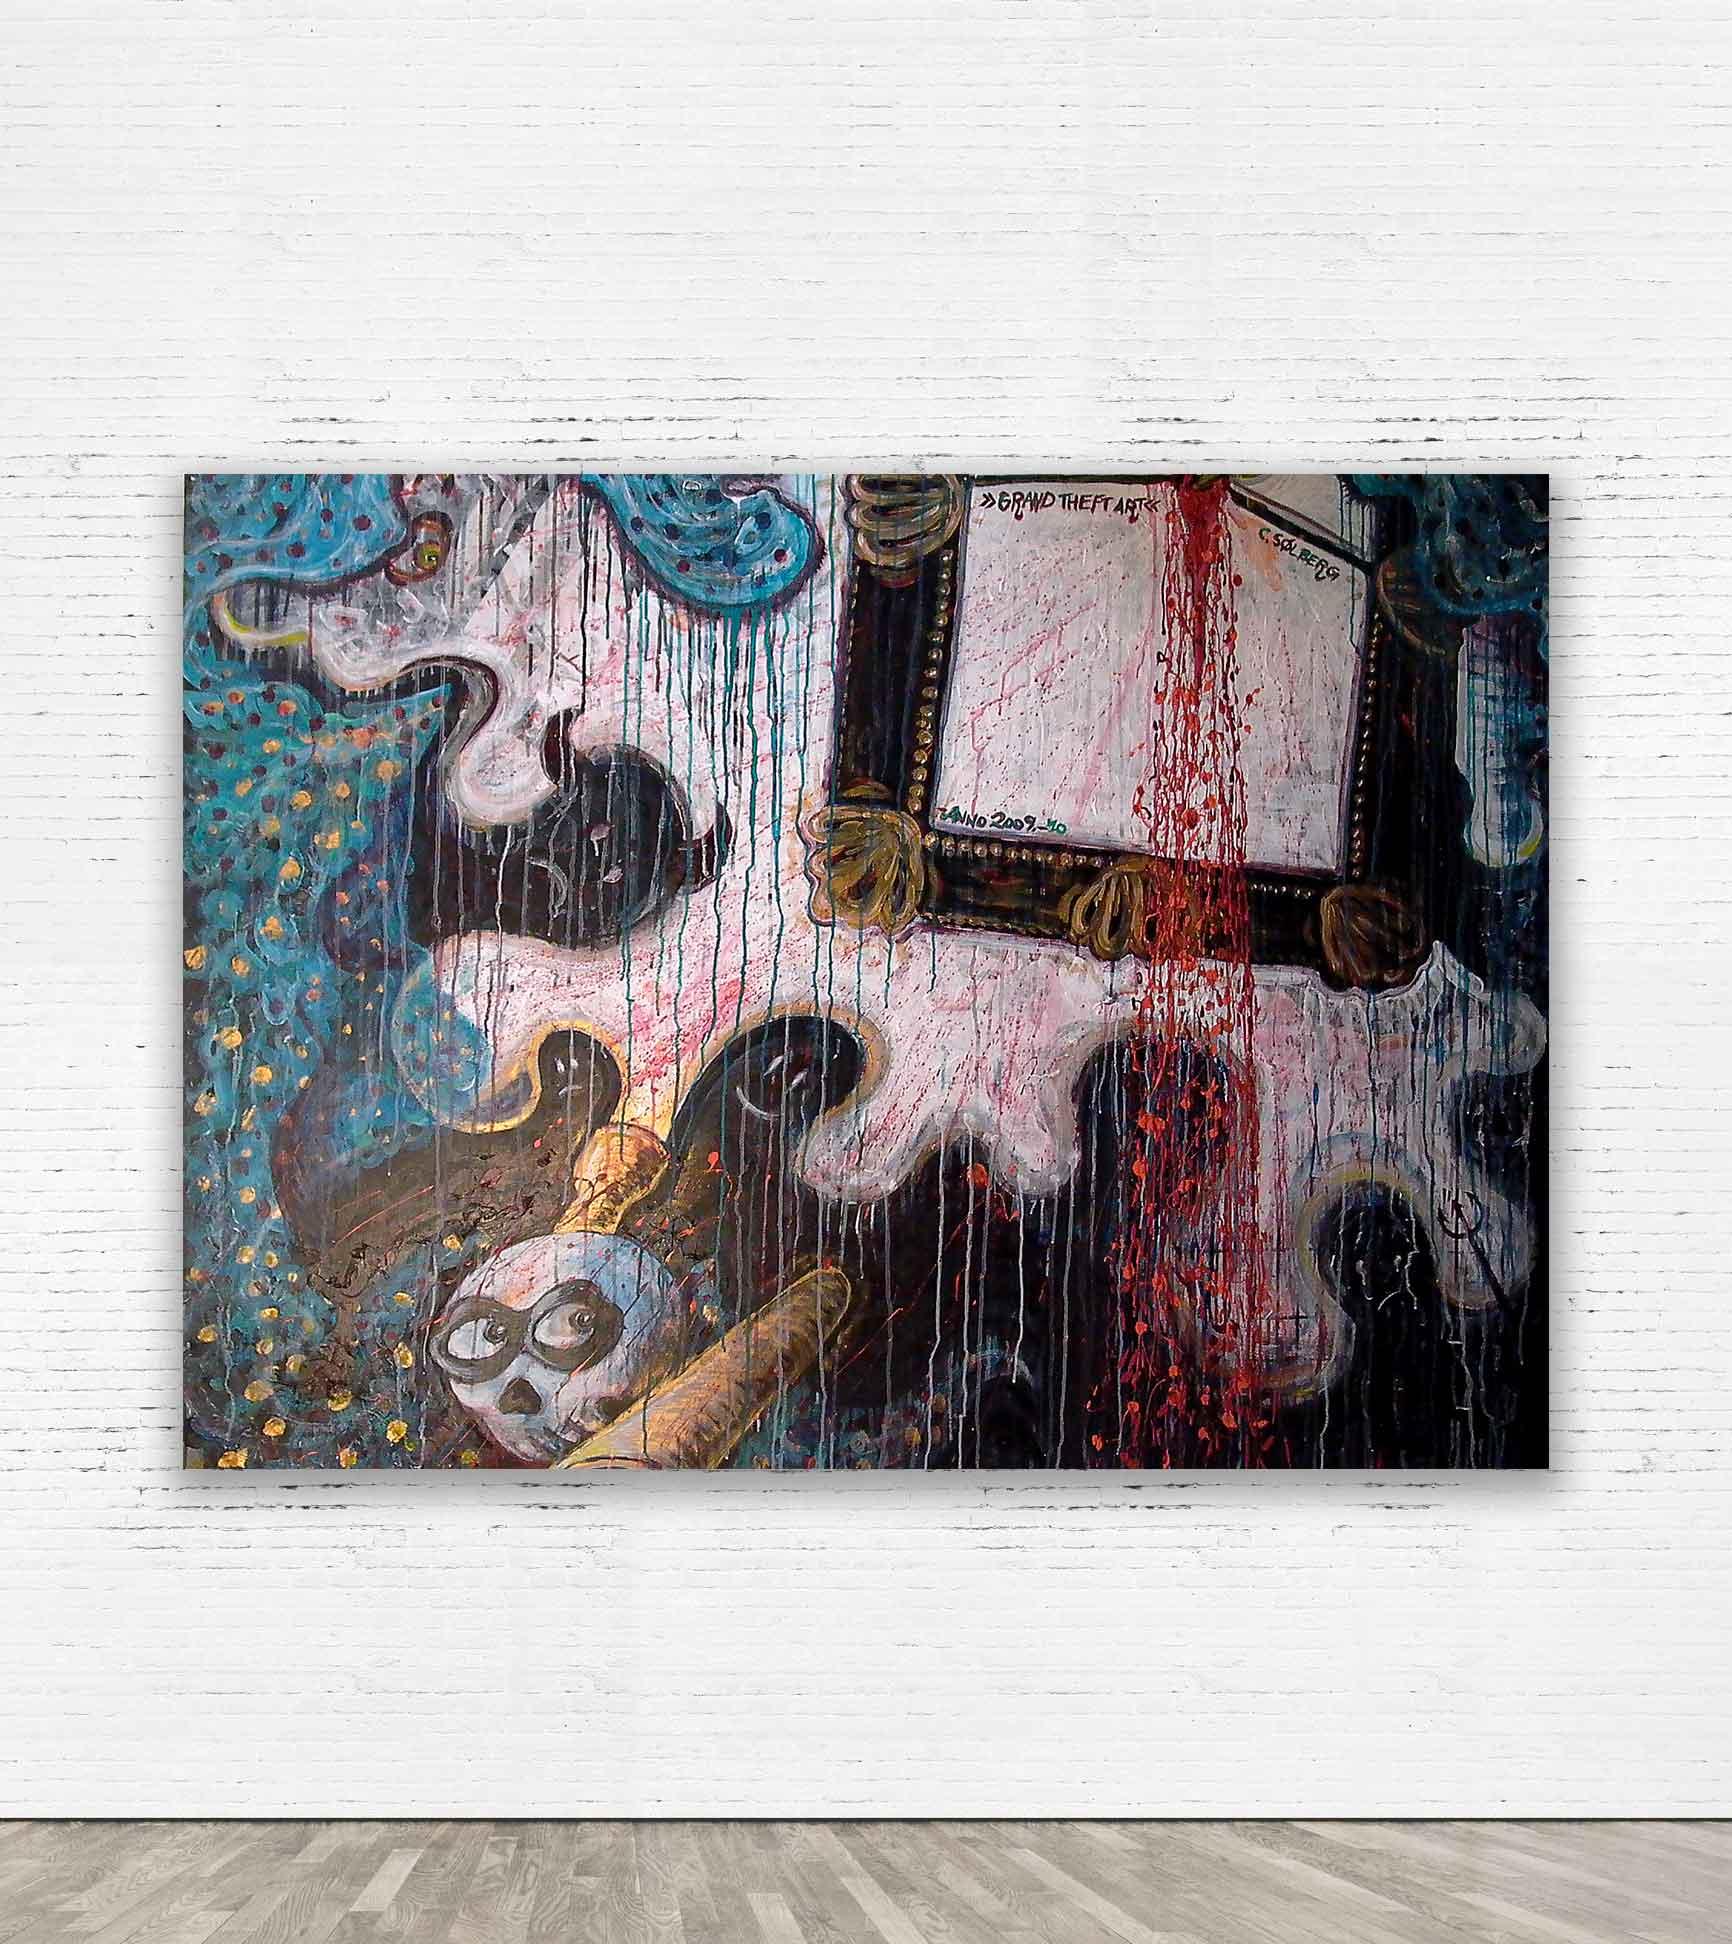 """GRAND THEFT ART""  2009. 160 x 120 cm. Acrylic on plywood"